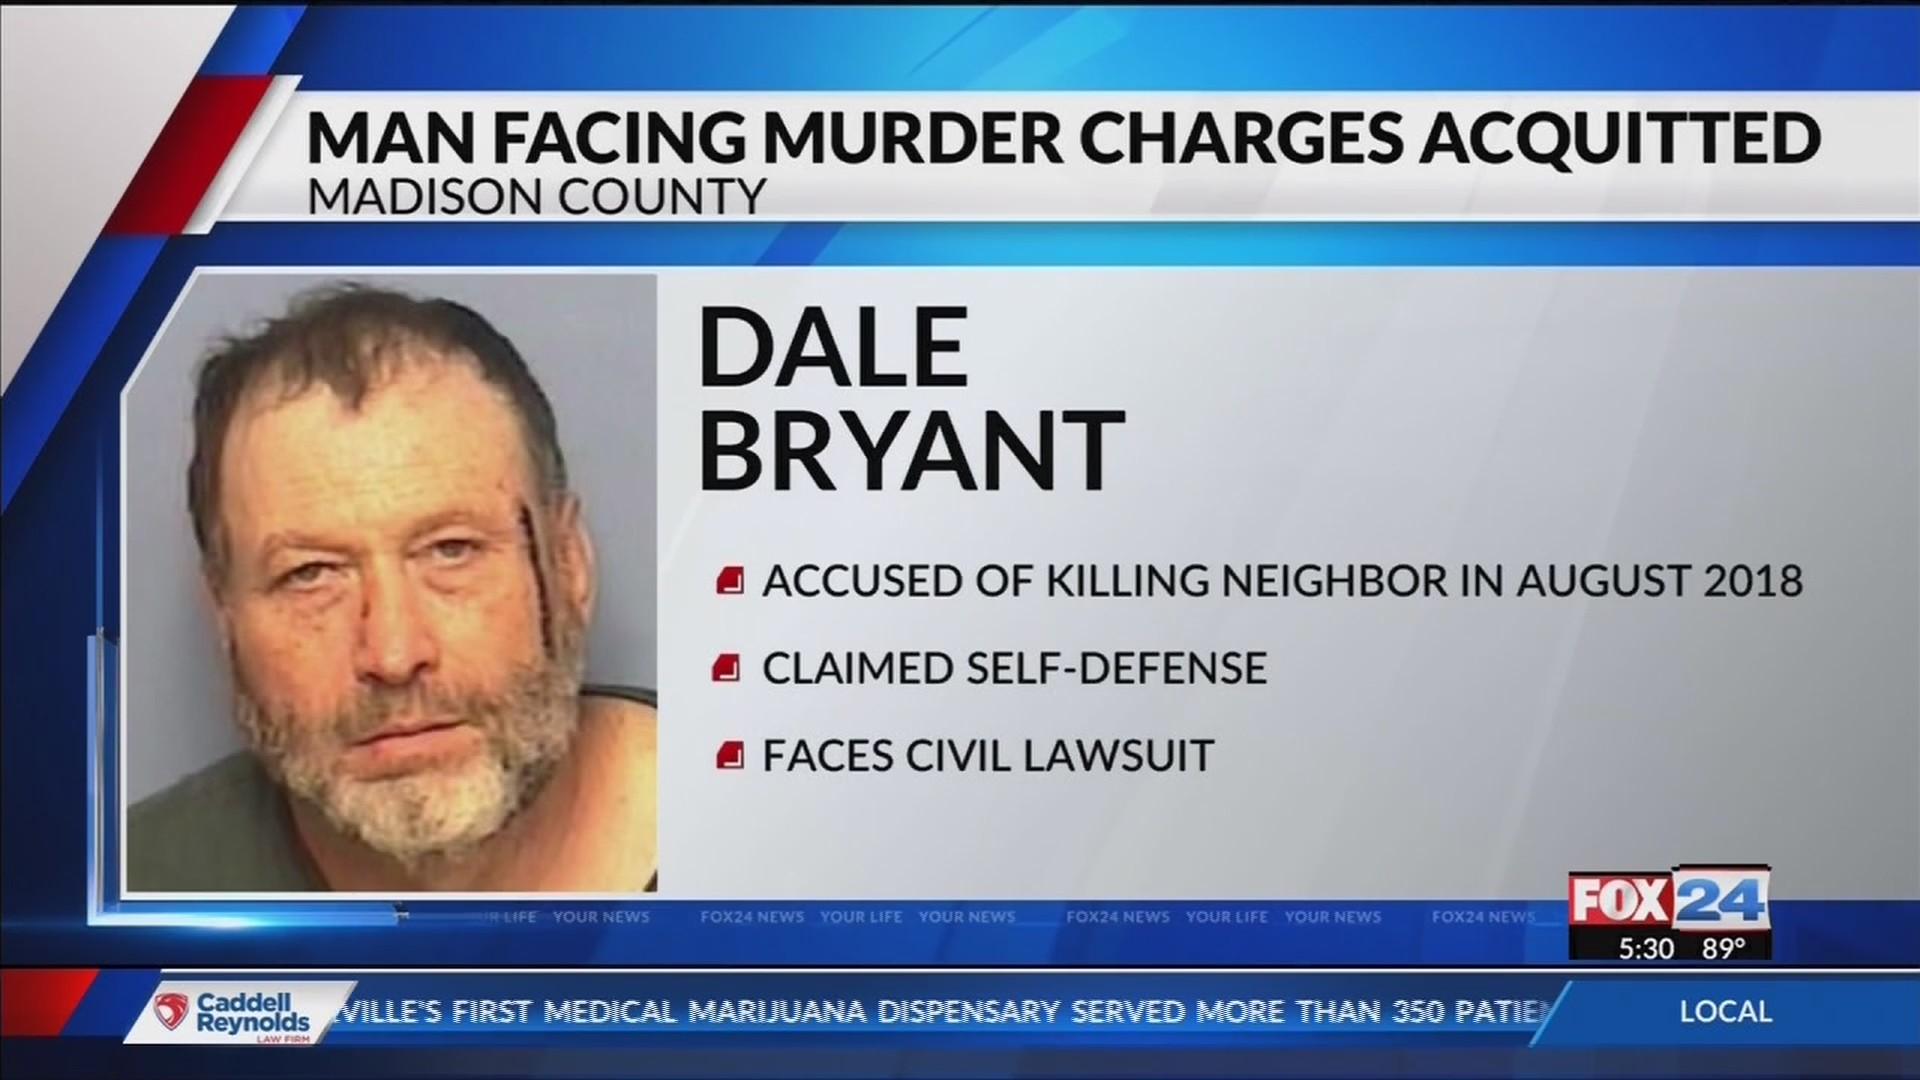 Dale Bryant